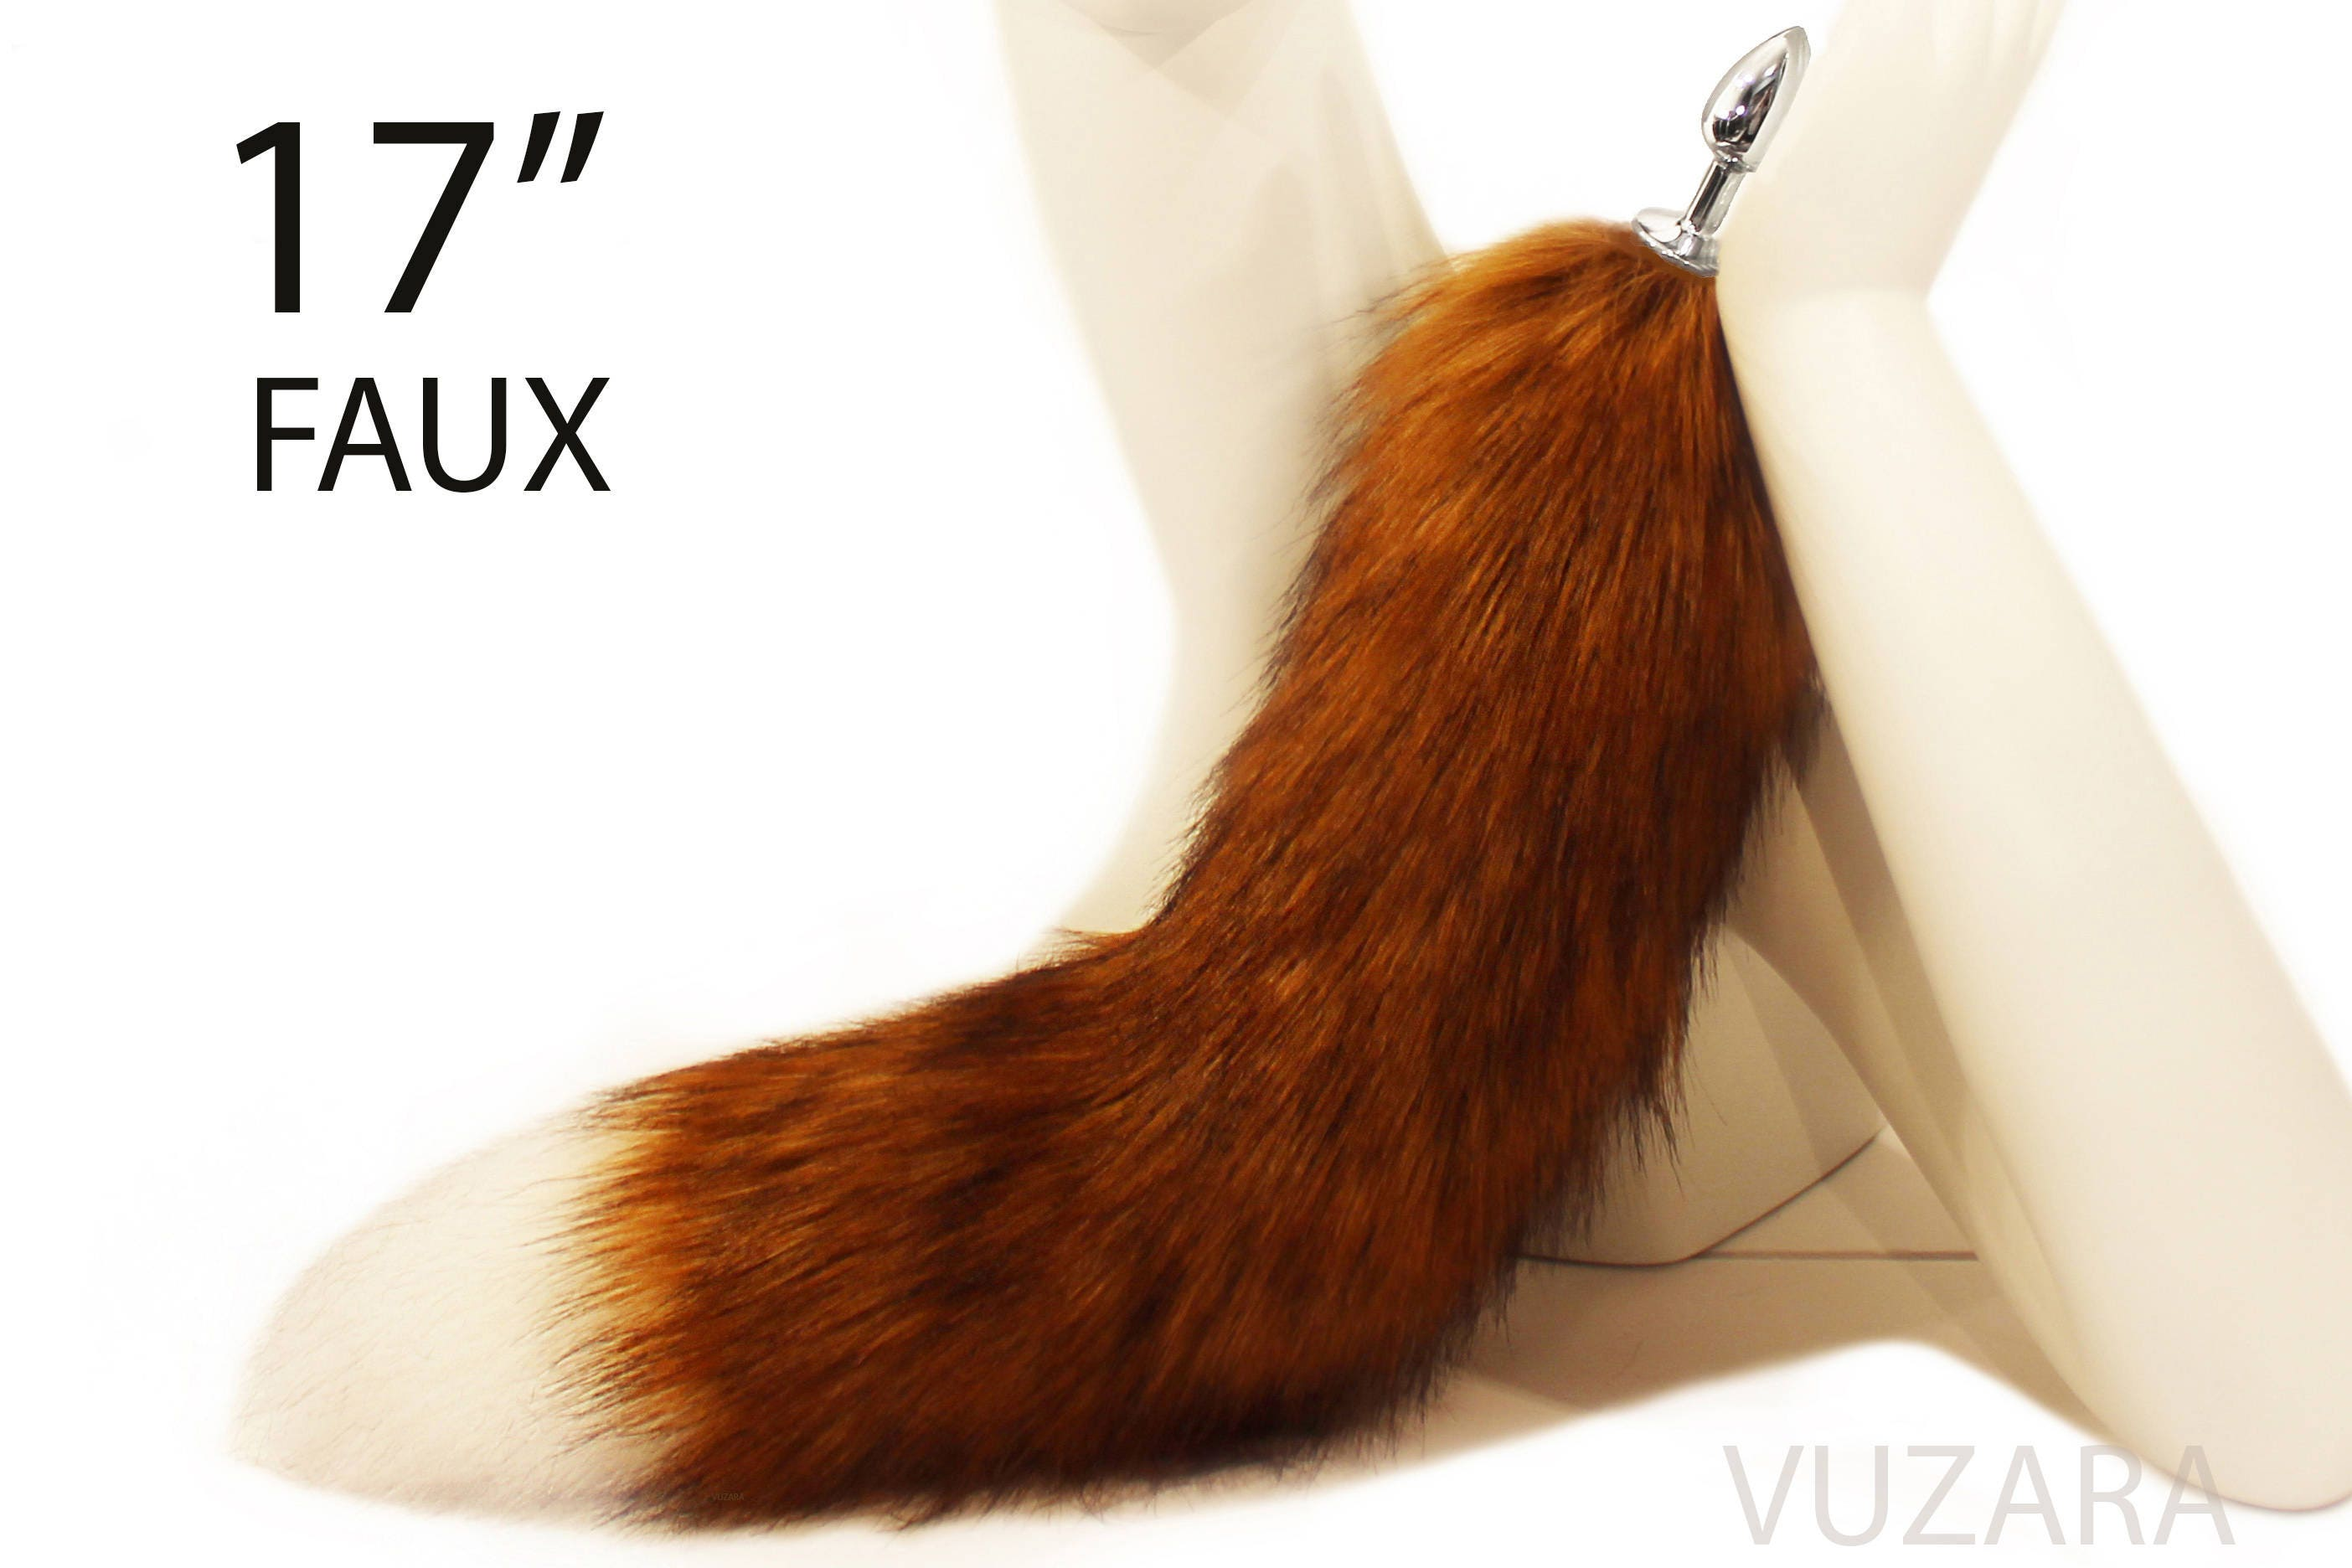 tail butt plug bdsm butt plug tail plug dildo fox tail butt